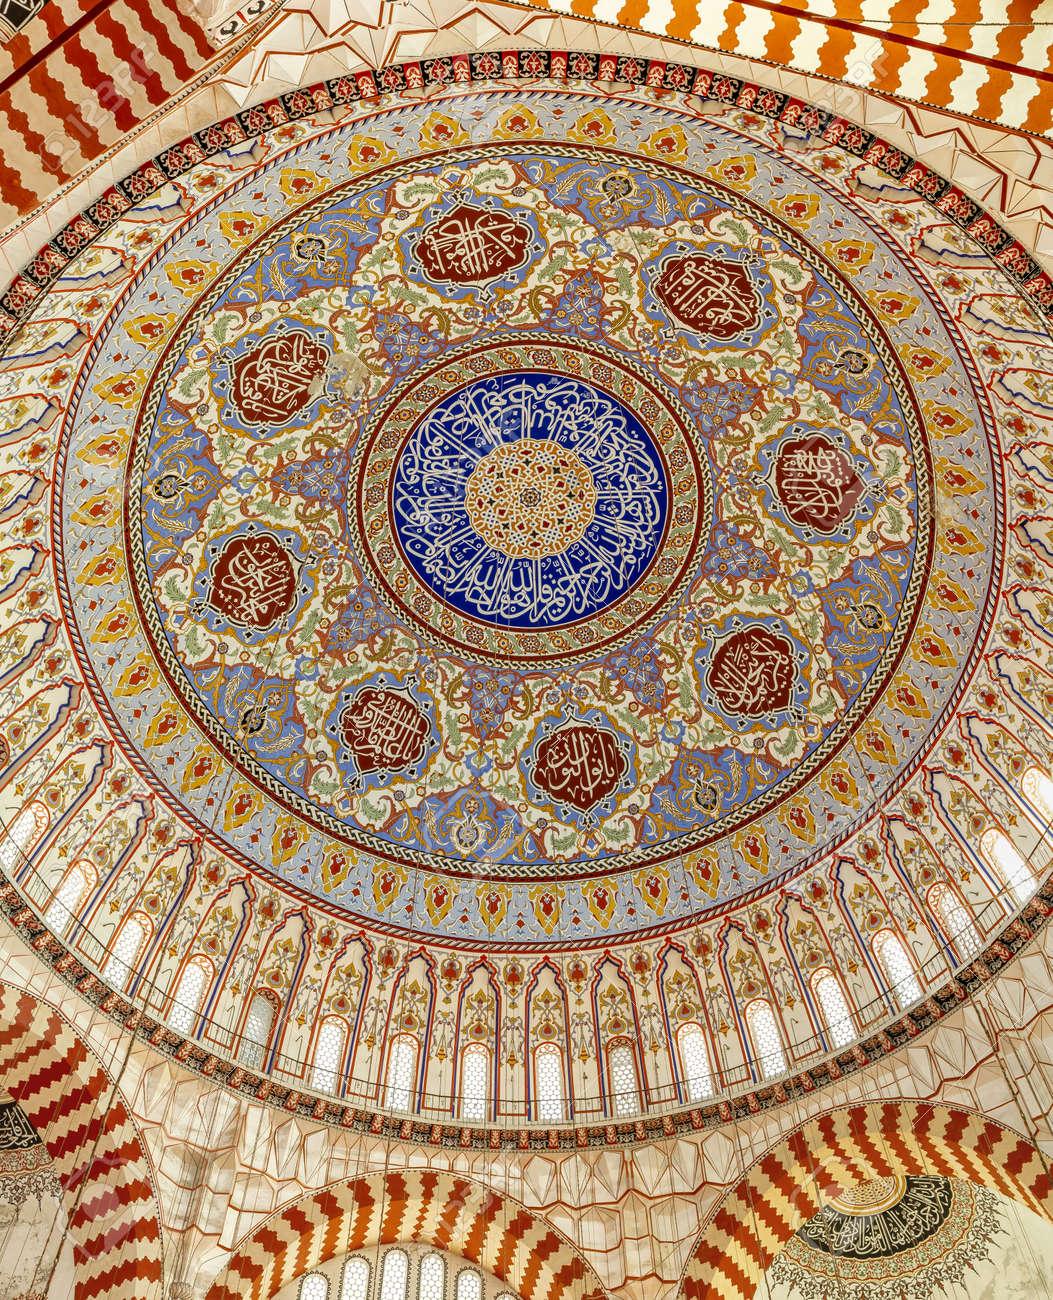 EDIRNE, TURKEY - 07,16,2011: Selimiye Mosque interior, panoramic view in Edirne, Turkey. Ottoman imperial mosque was designed by Mimar Sinan - 163031526